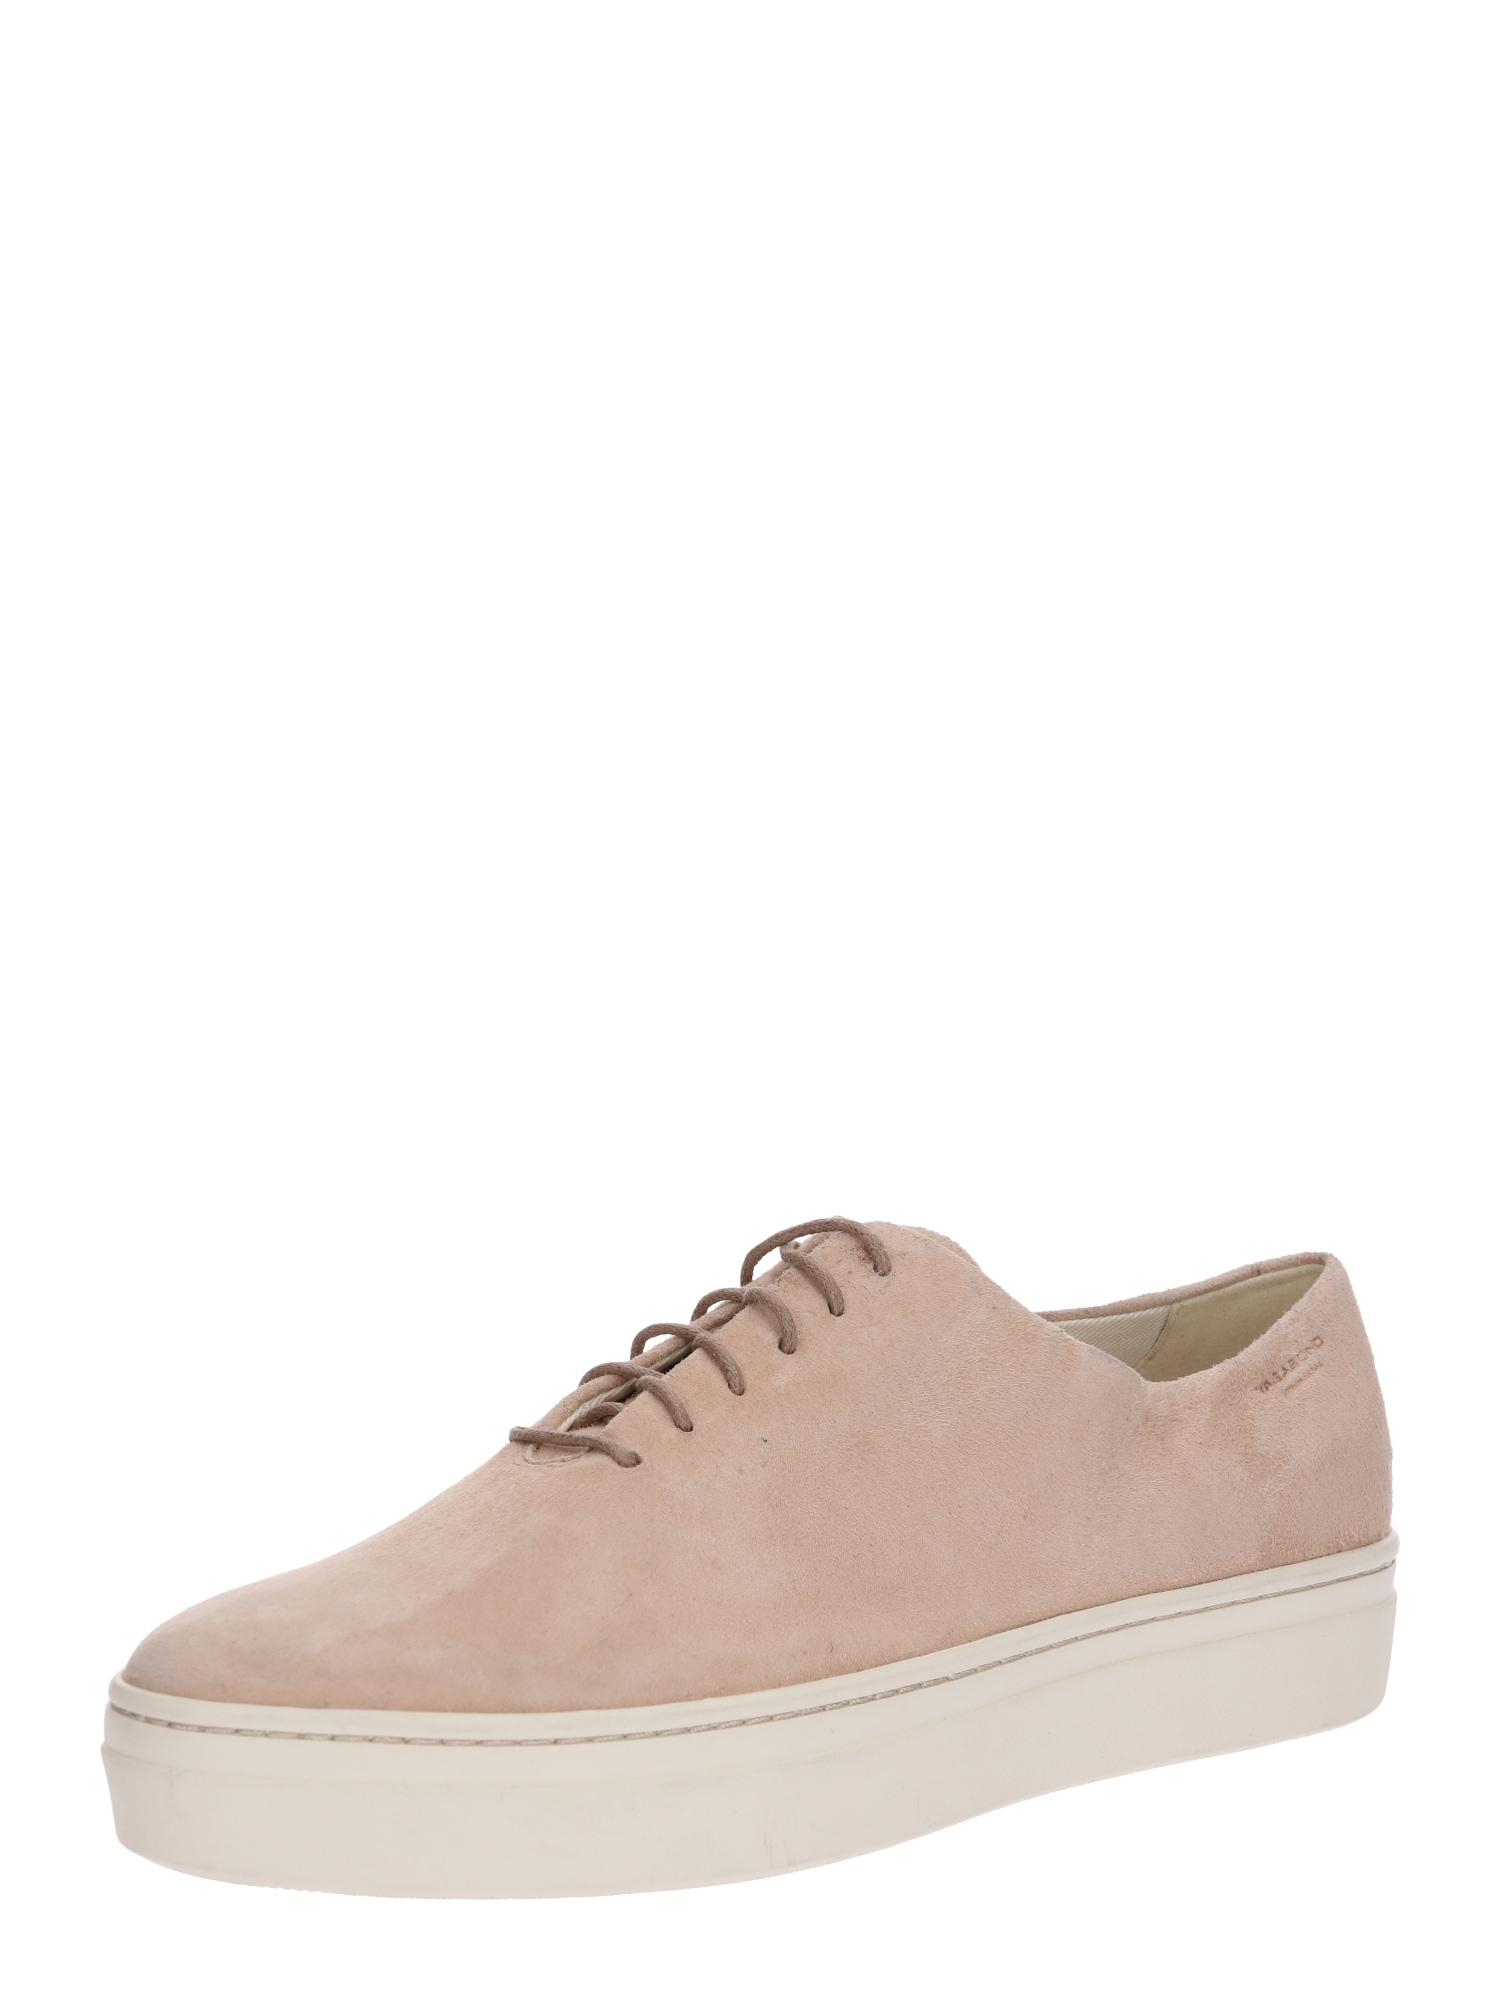 Šněrovací boty Camille béžová bílá VAGABOND SHOEMAKERS